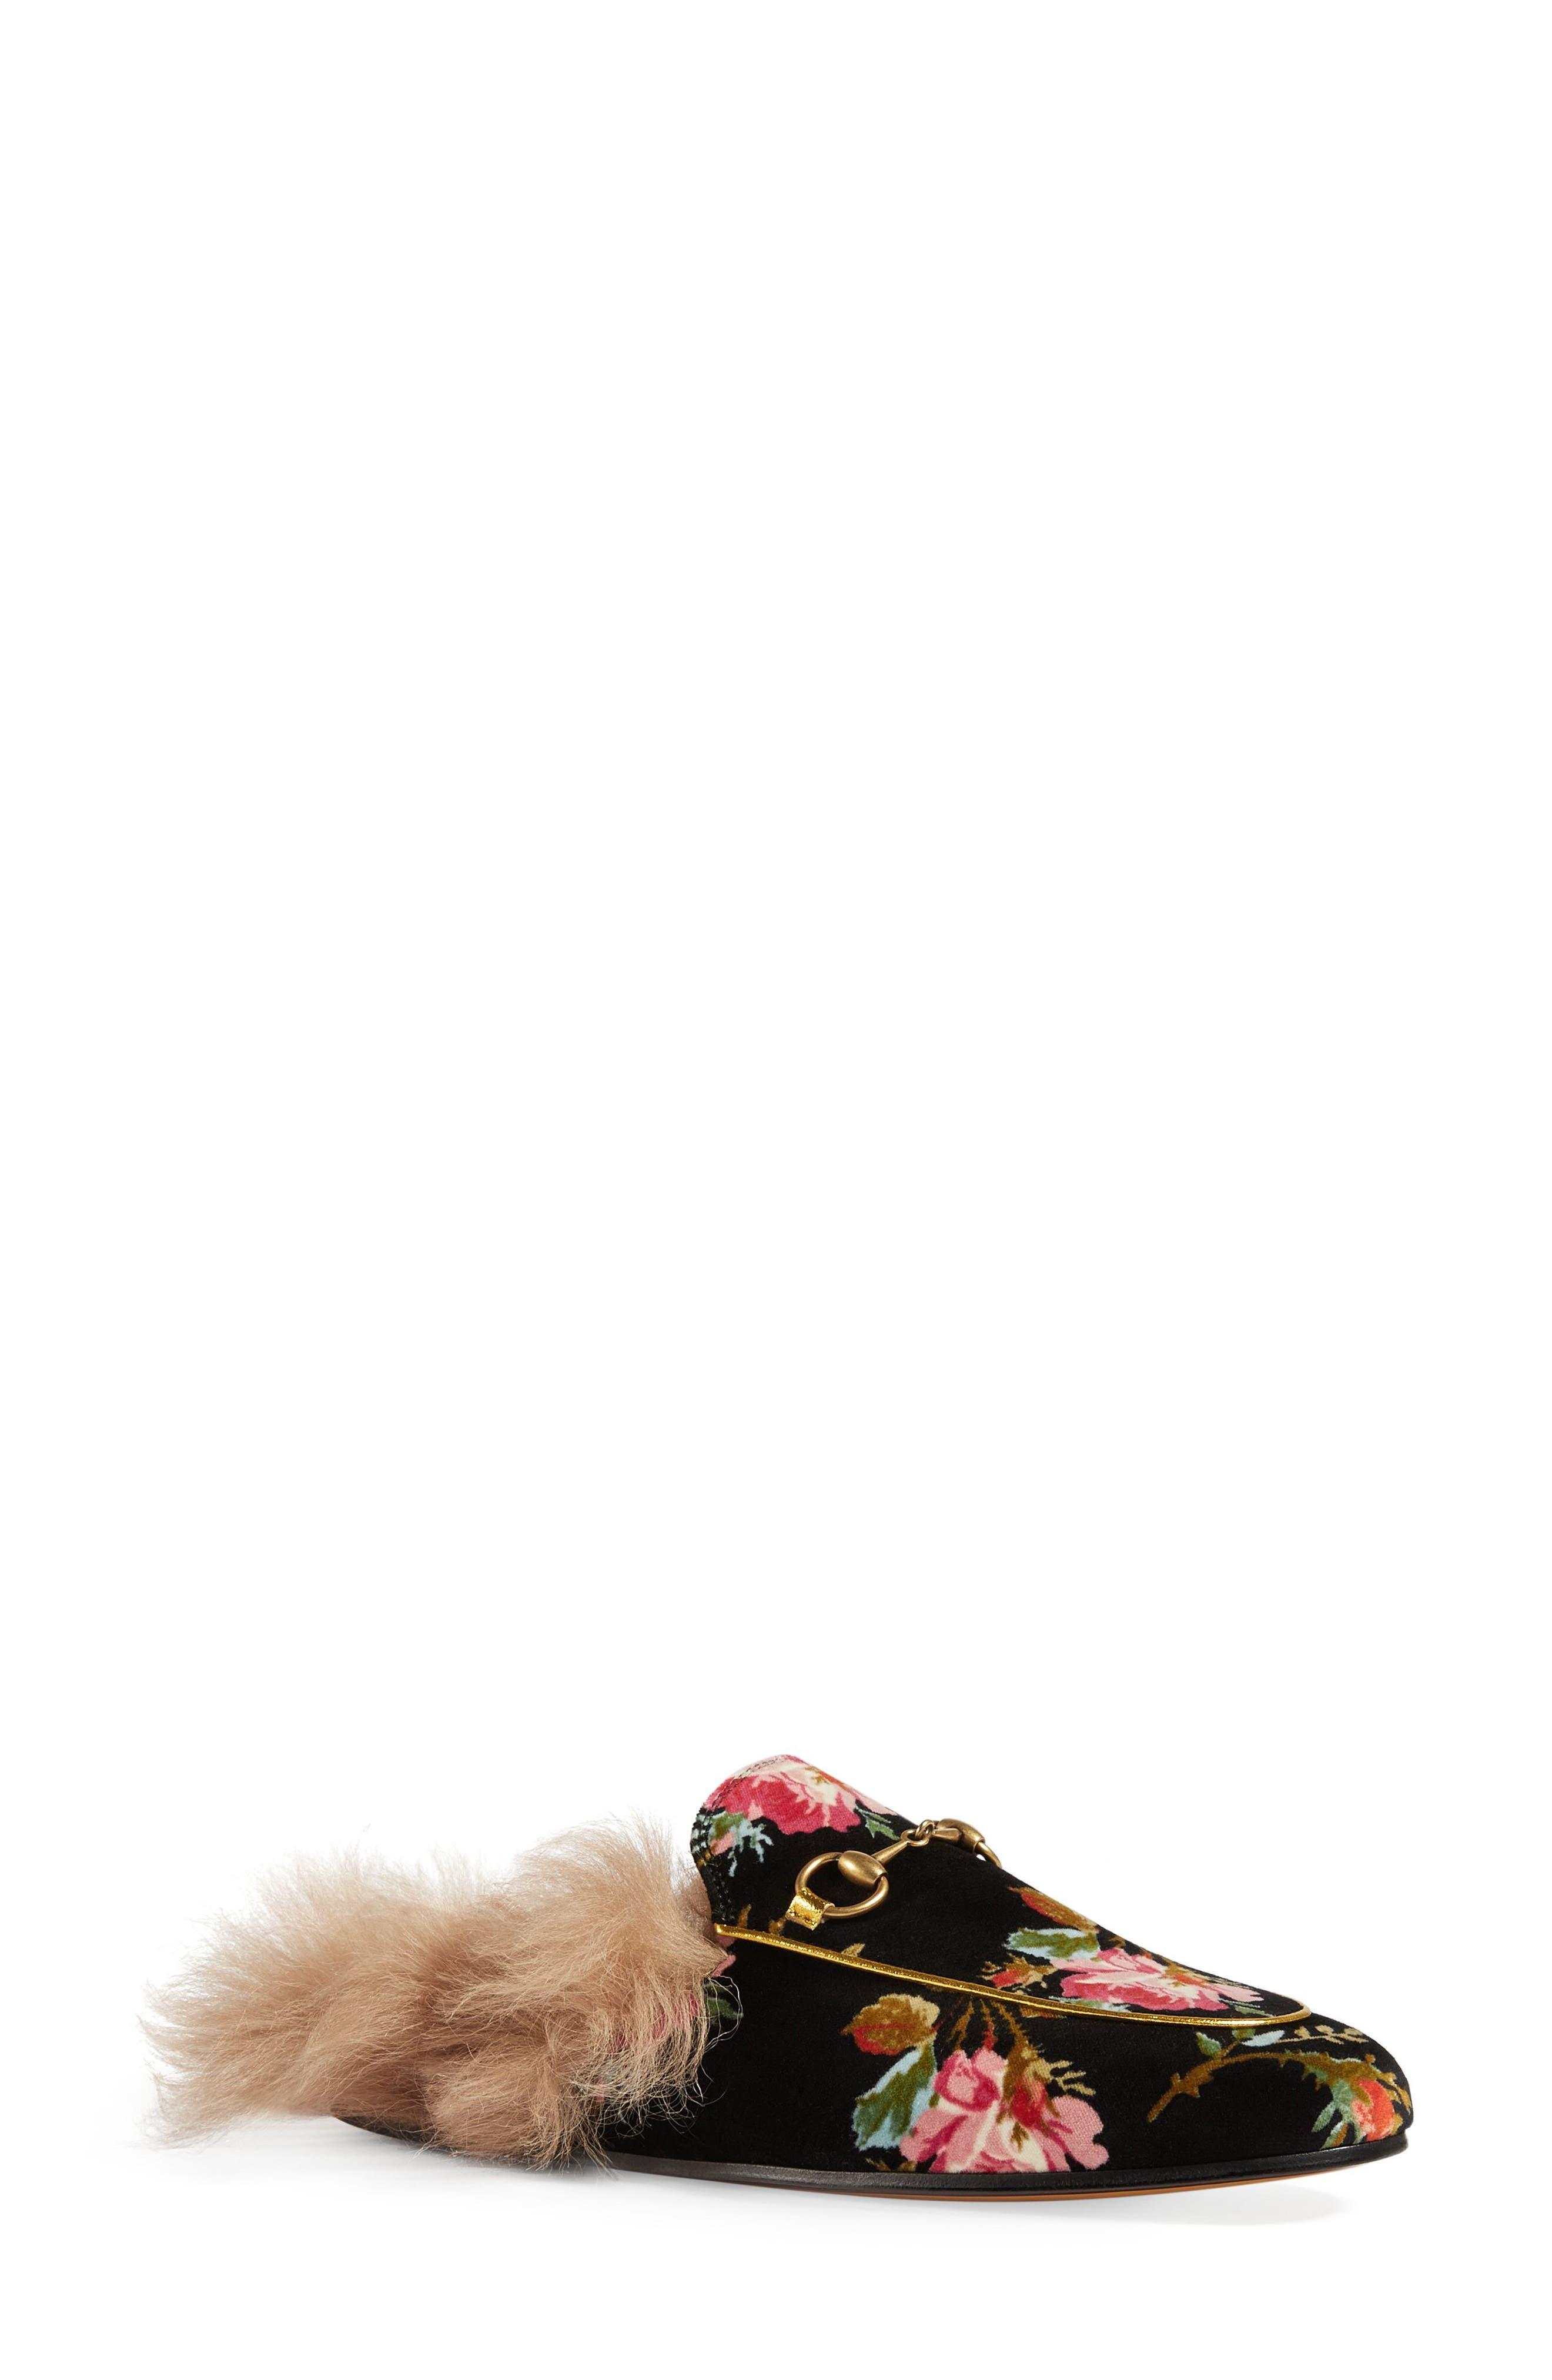 Main Image - Gucci Princetown Floral Genuine Shearling Trim Mule (Women)